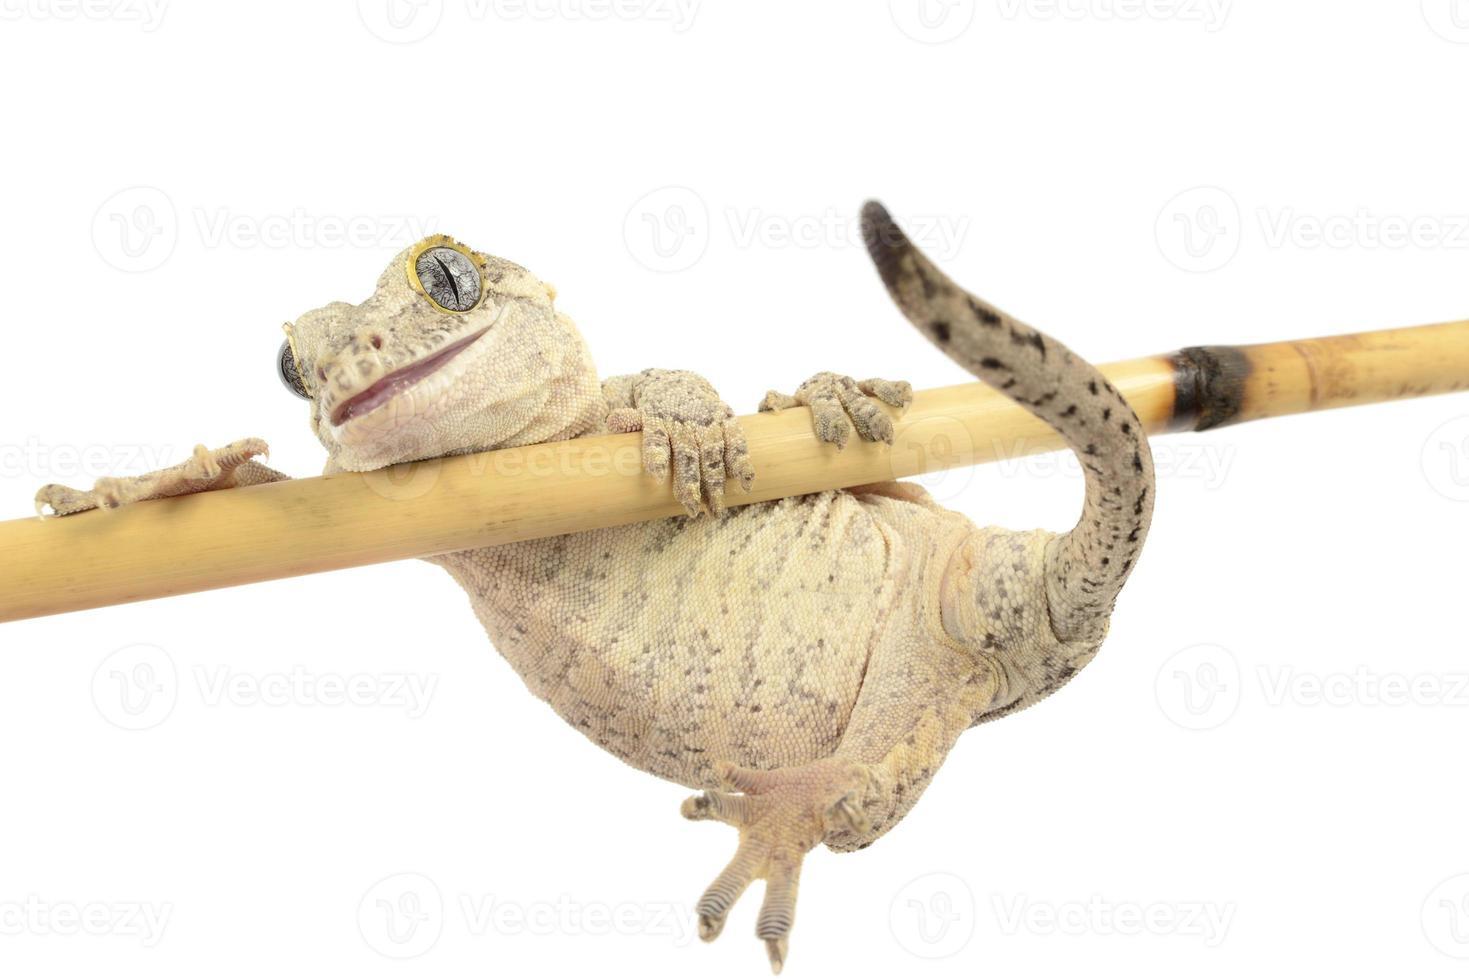 gargoyale geck aferrándose al bambú foto